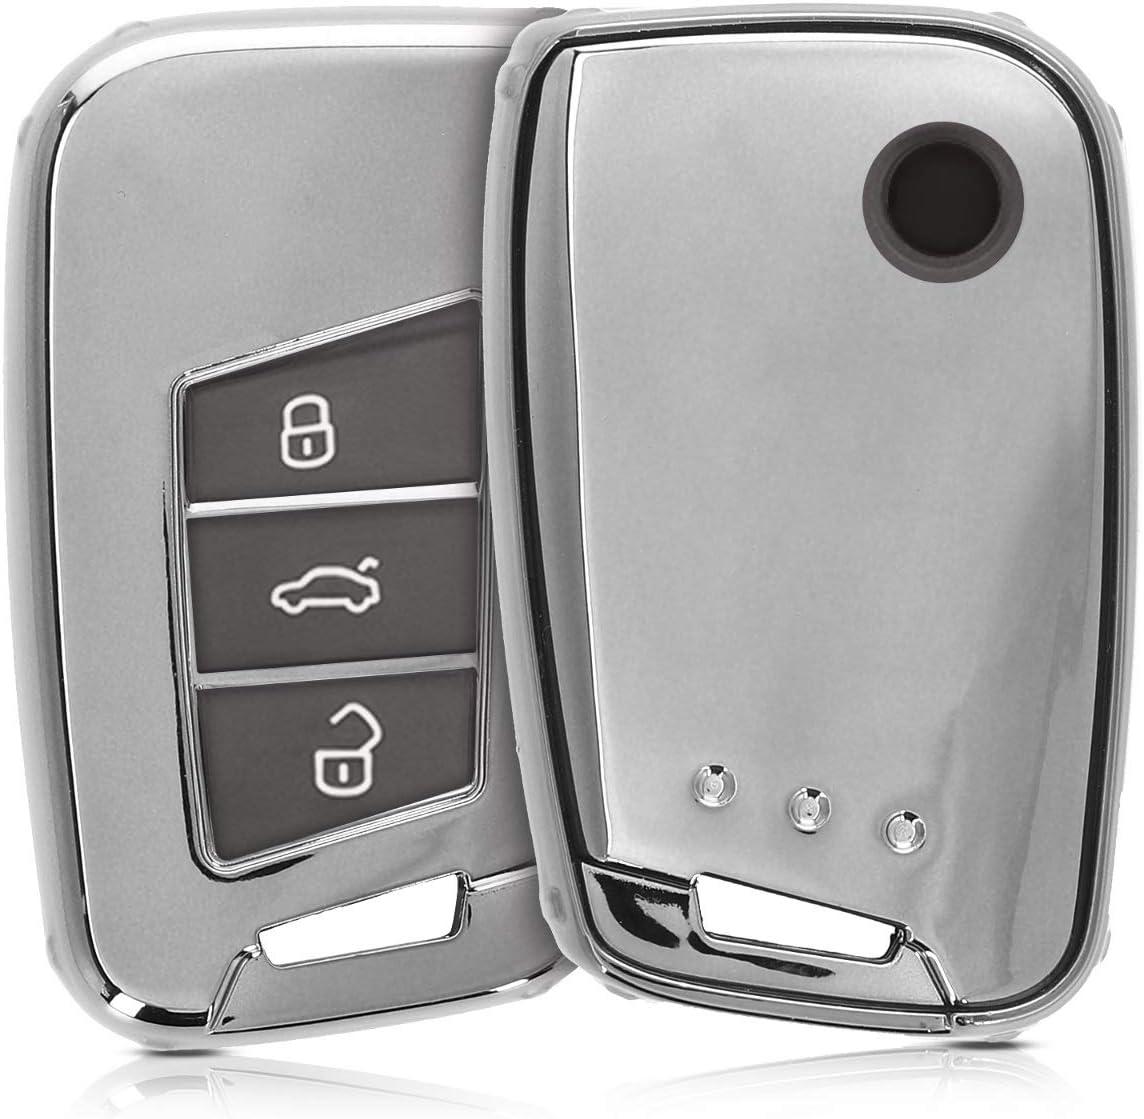 Kwmobile Autoschlüssel Hülle Kompatibel Mit Vw 3 Tasten Elektronik